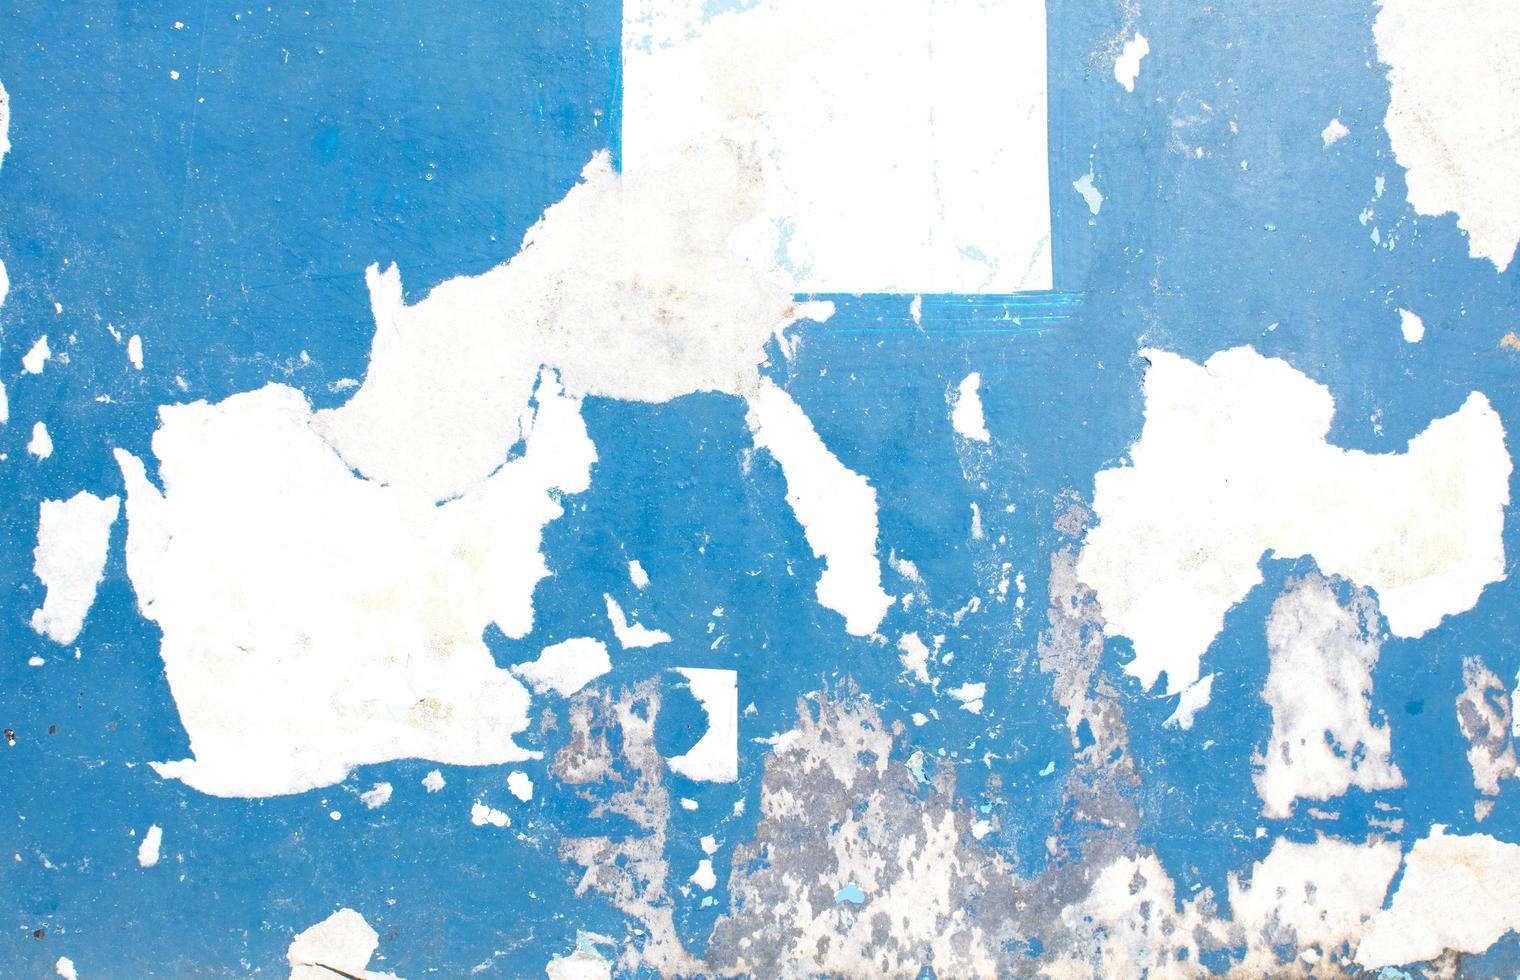 peinture écaillée bleue photo